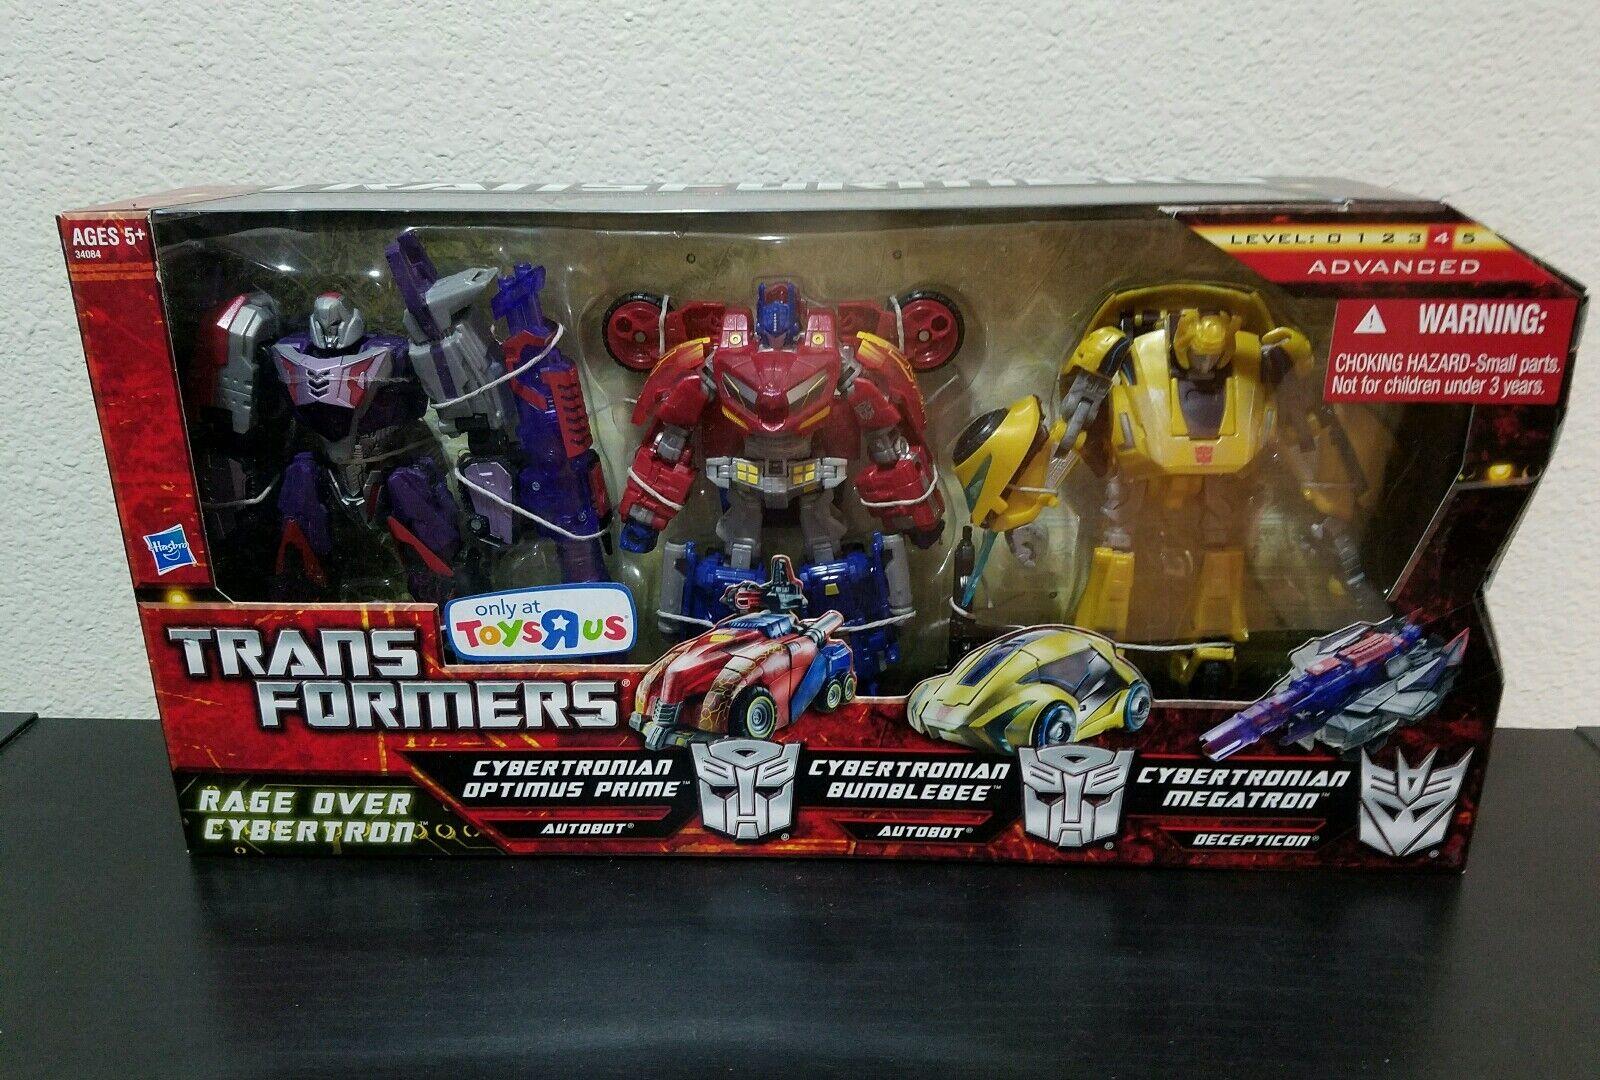 Cybertronian Optimus Prime Bumblebee Megatron Rage  Over Cybertron War MISB  ultimi stili